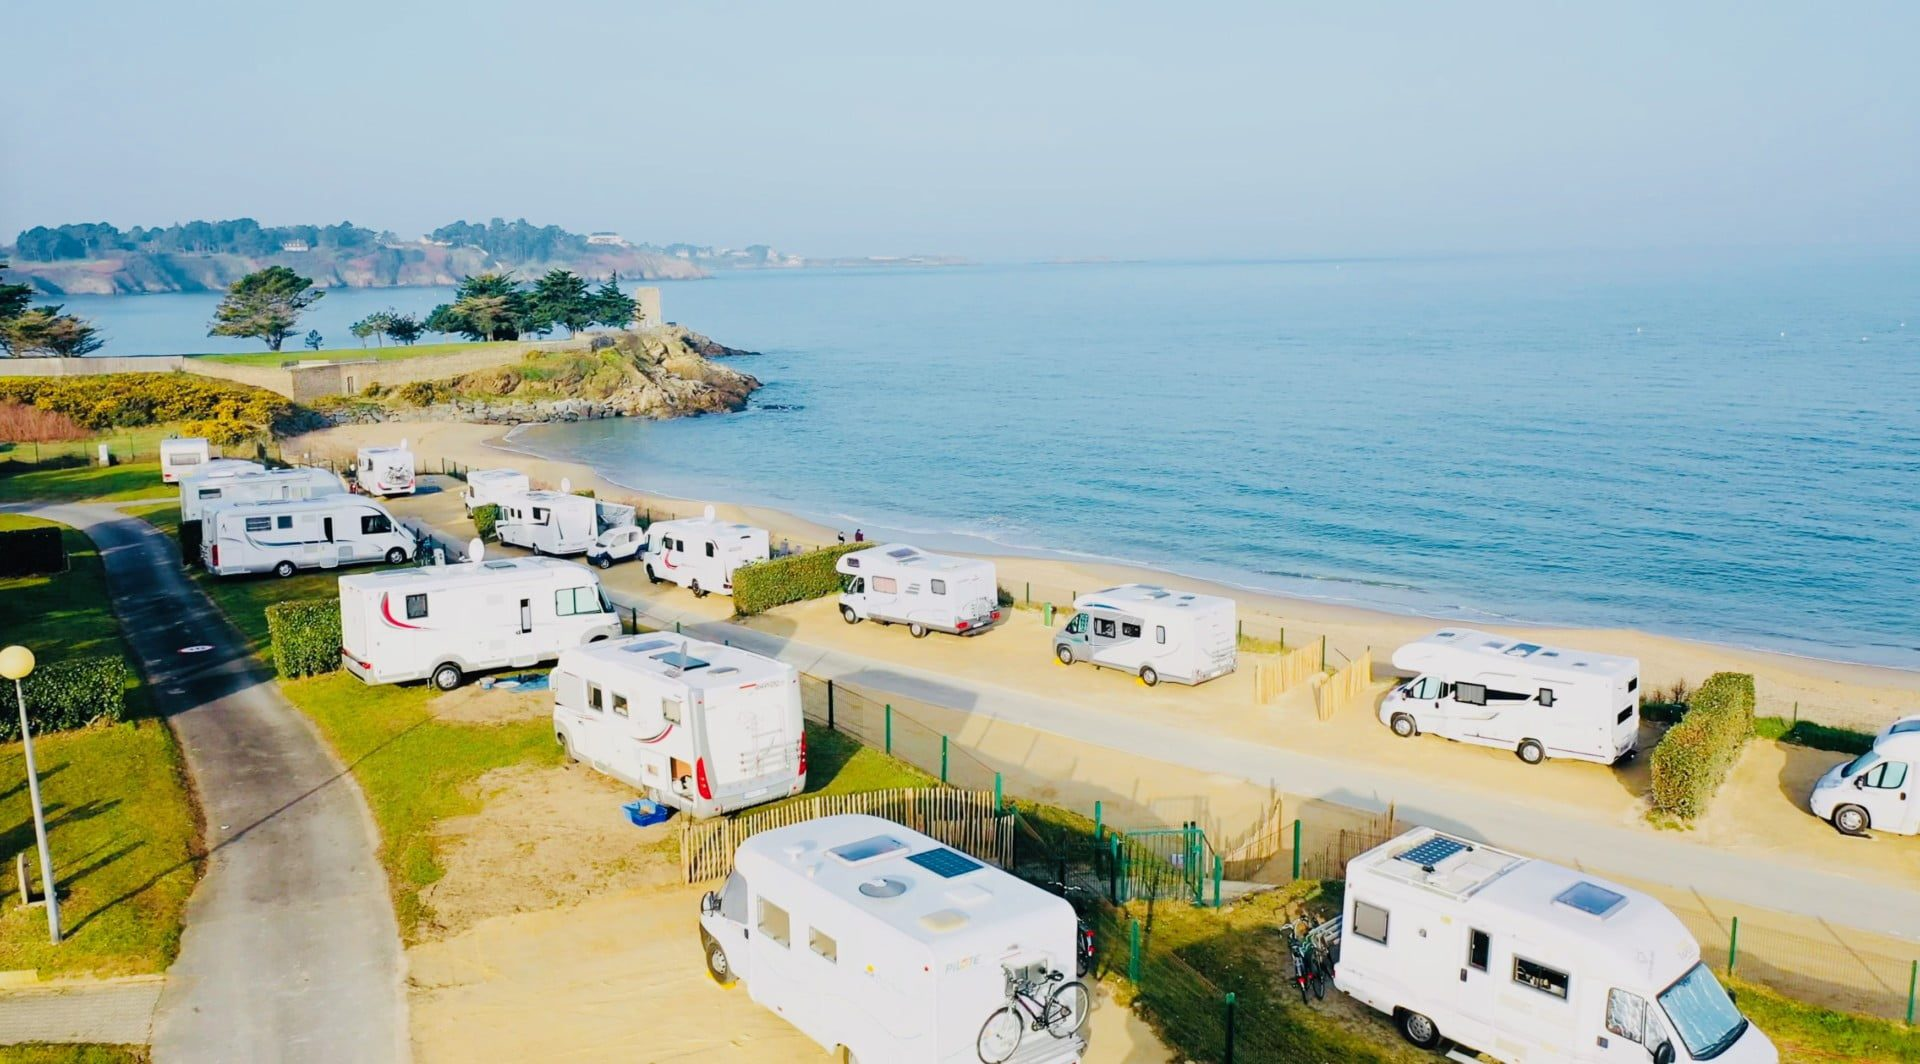 Camping-Port-Blanc-DINARD-Vue-Mer-vacances-détente-nature-